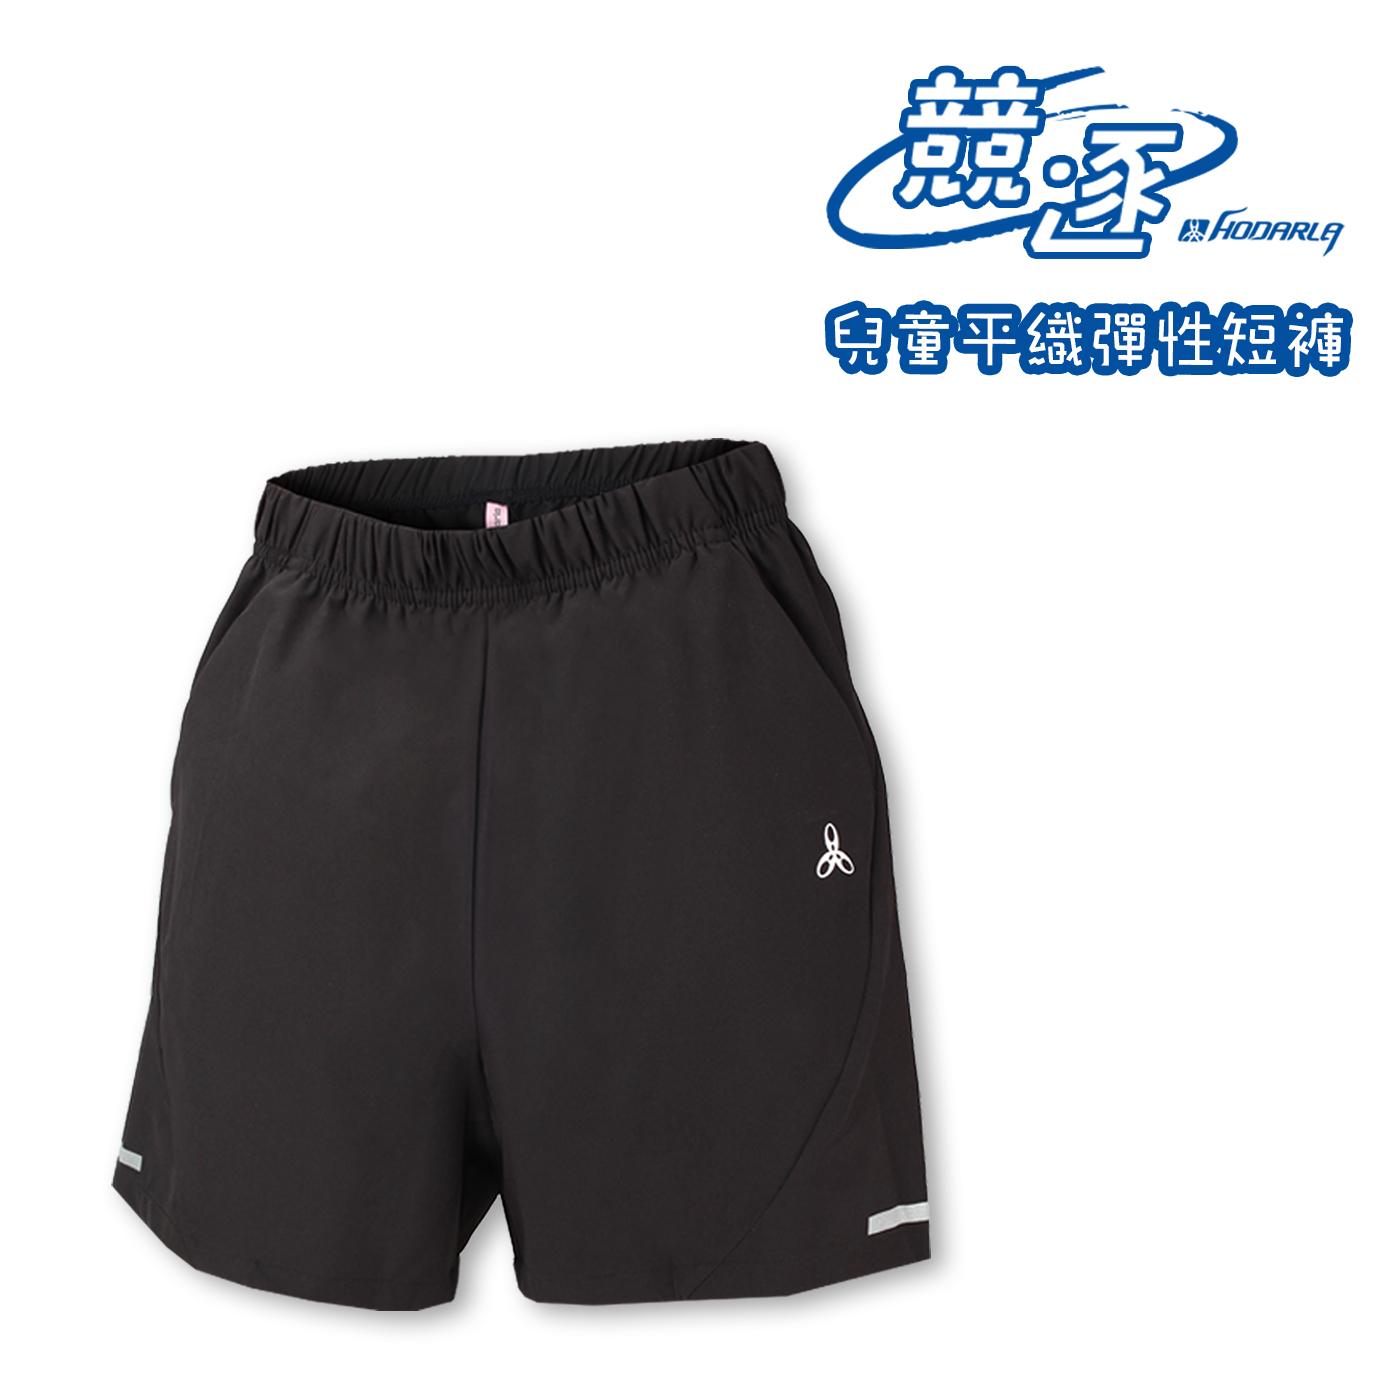 HODARLA 童-競逐平織彈性短褲 3144101 - 黑